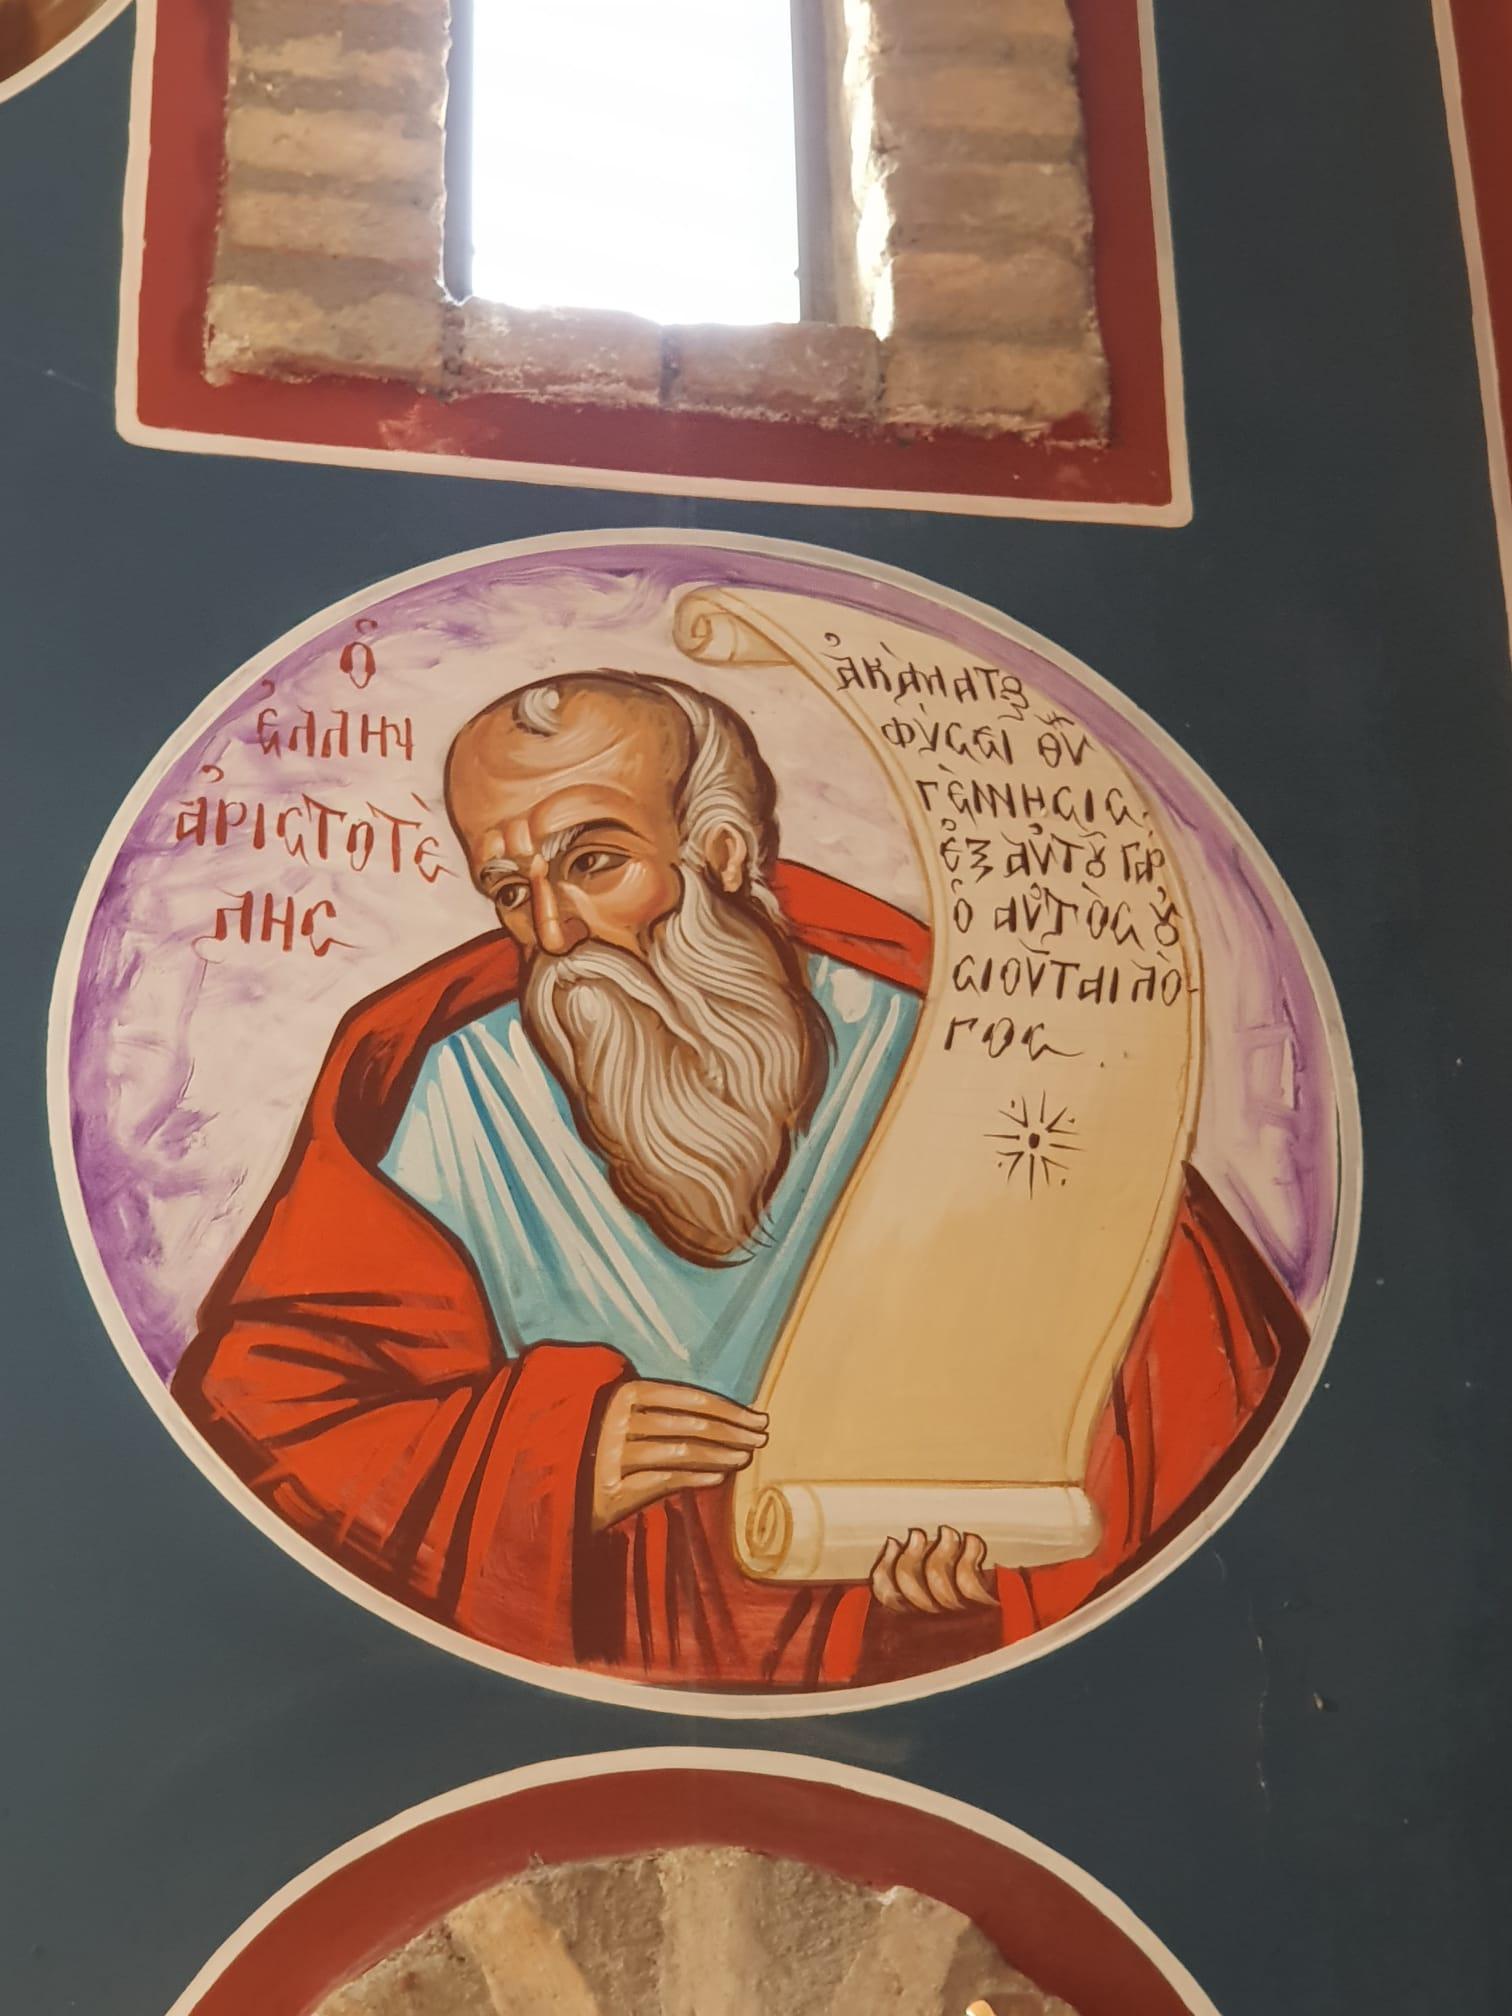 Monastero Santi Elia e Filarete (Seminara) – Aristotele il Greco